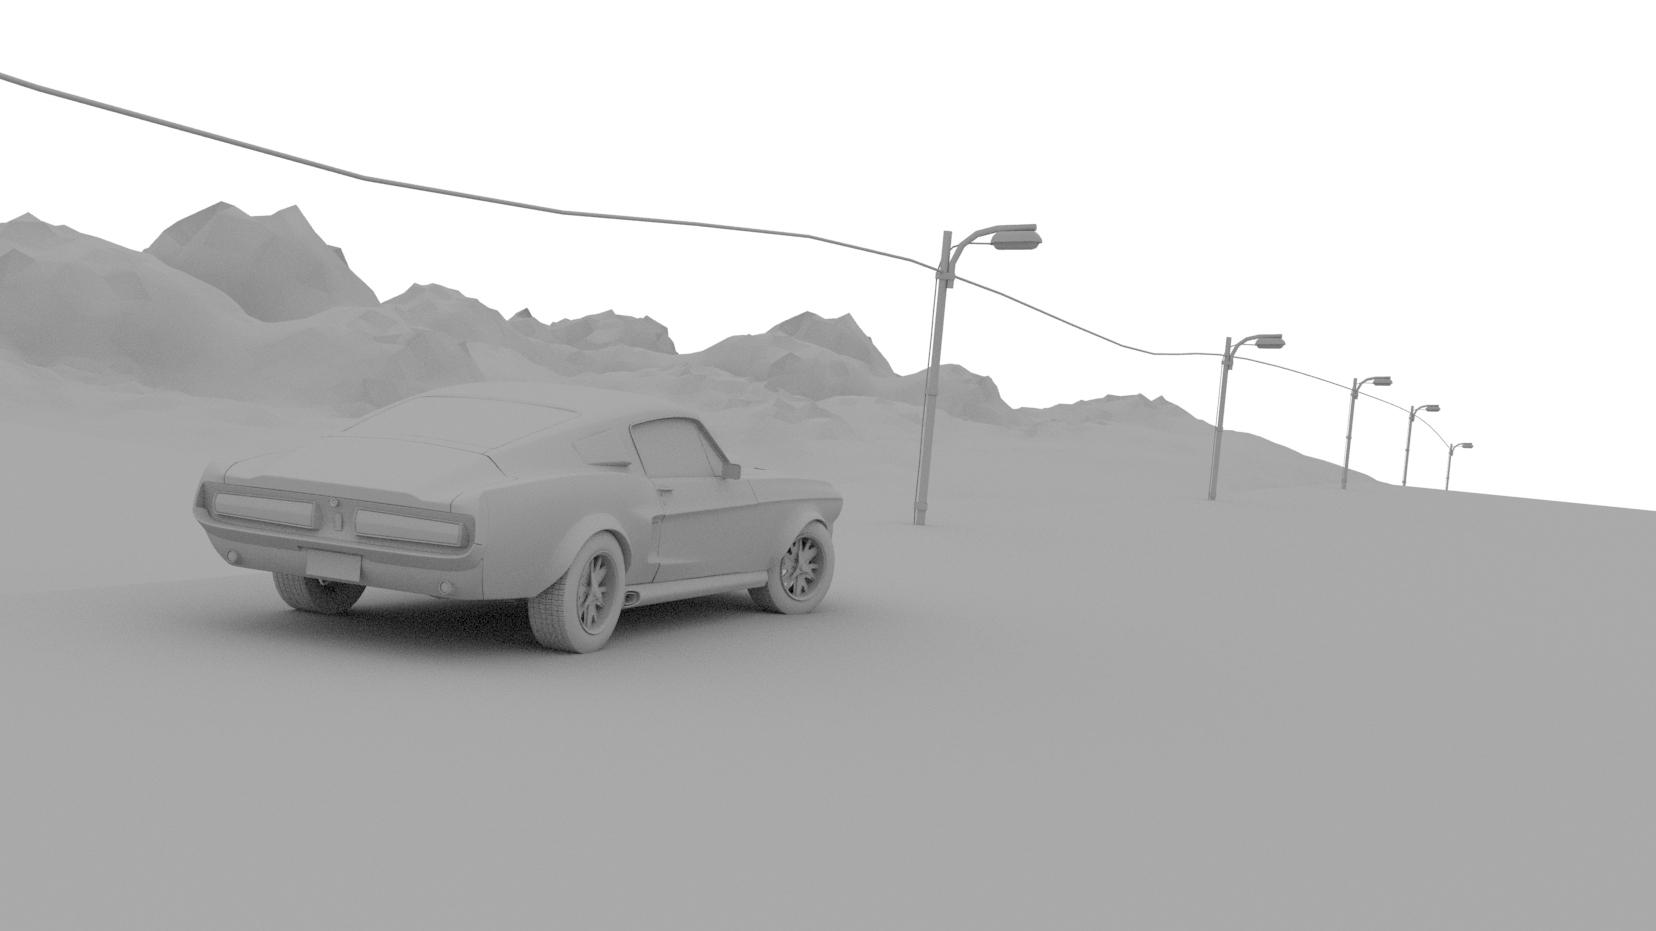 Shelby Mustang 1967 Eleanor - Car Render Challenge 2020